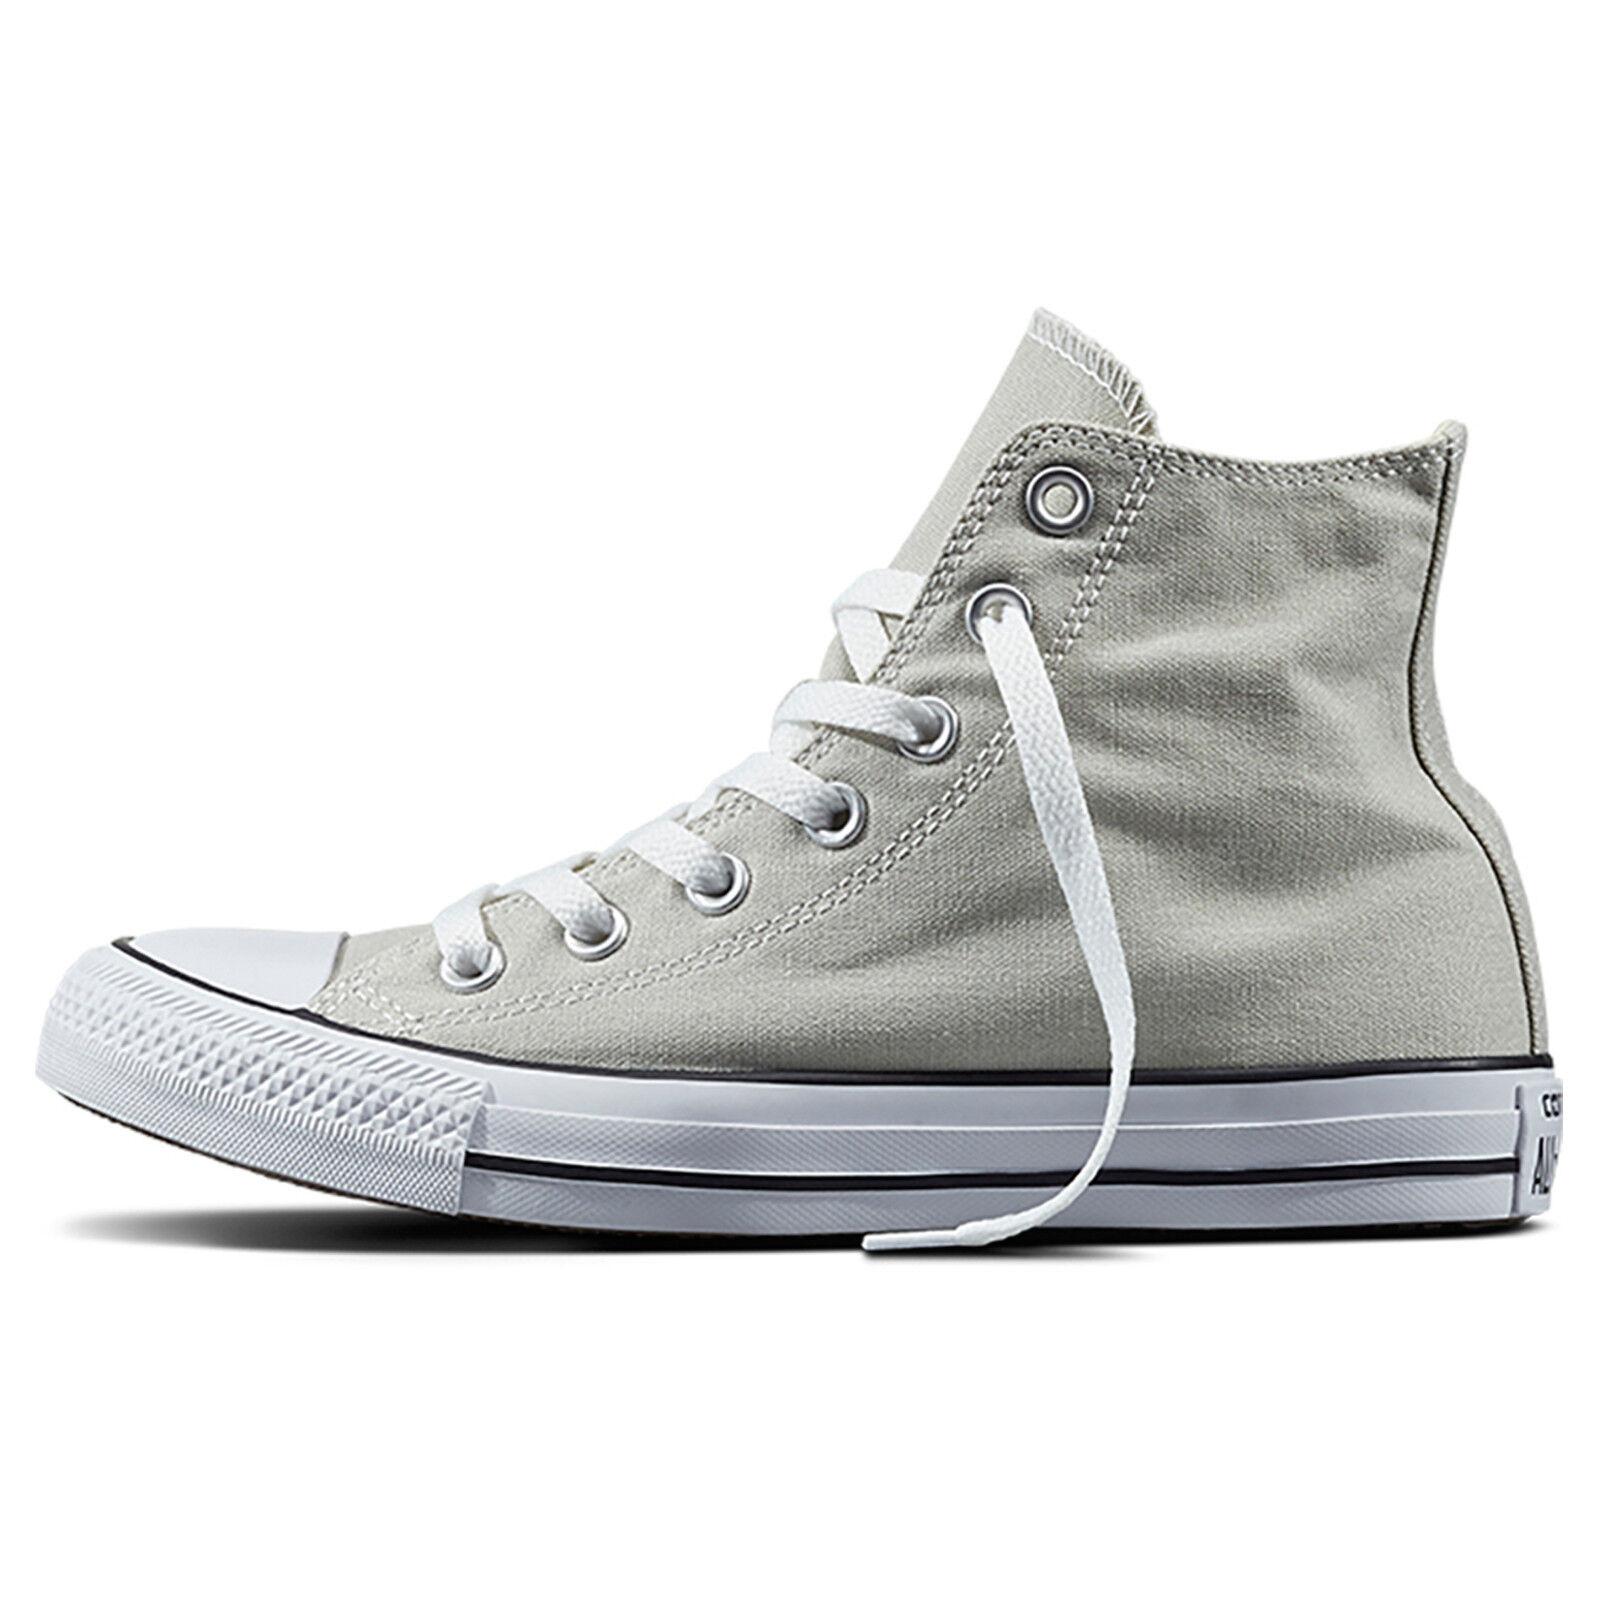 Converse Sondermodelle 2017 All Star HI Schuhe Schuhe Chucks Schuhe Schuhe Herren Damen f7f291